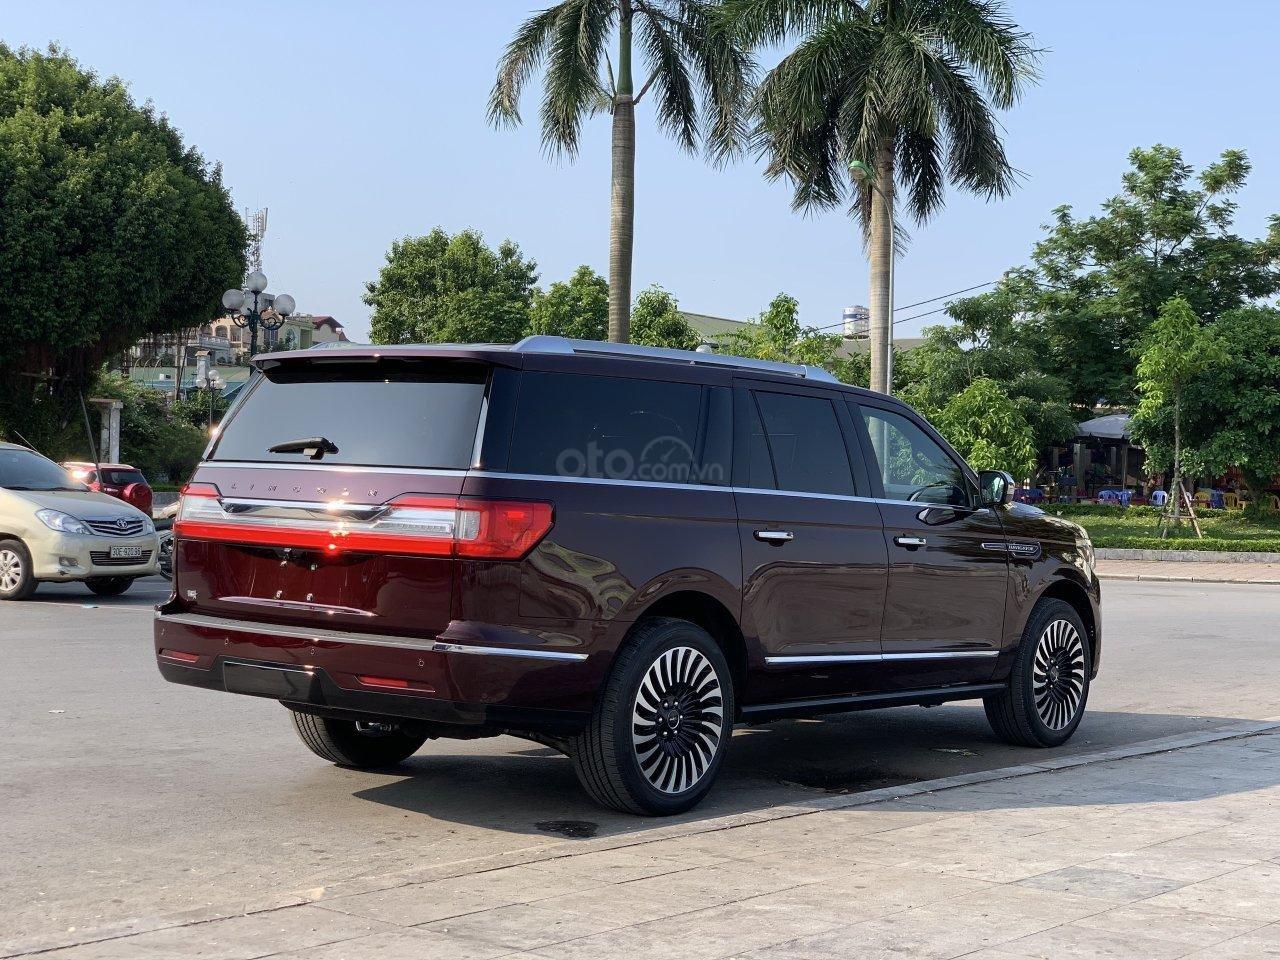 Giao ngay Lincoln Navigator Black Label sản xuất 2019, mới 100%, giá tốt (2)